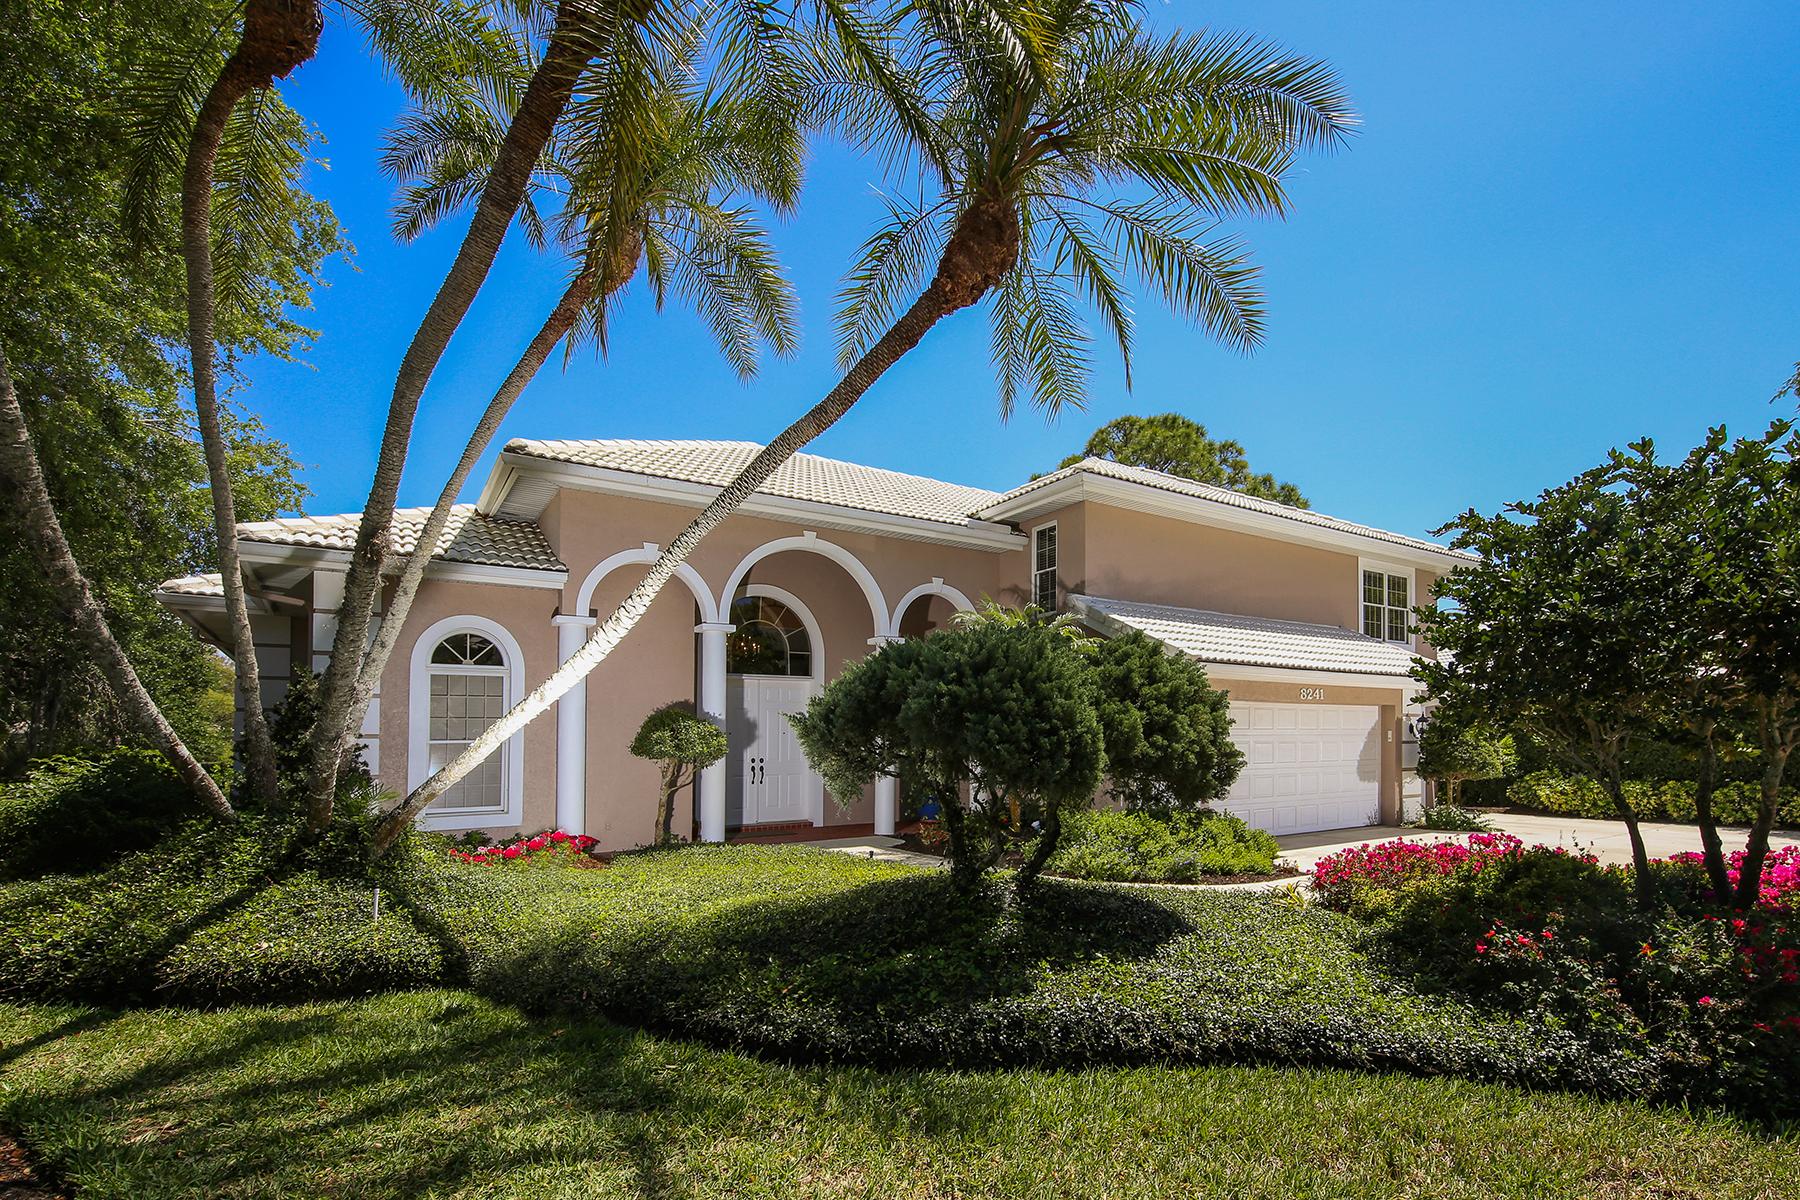 Moradia para Venda às DEER CREEK 8241 Shadow Pine Way Sarasota, Florida, 34238 Estados Unidos